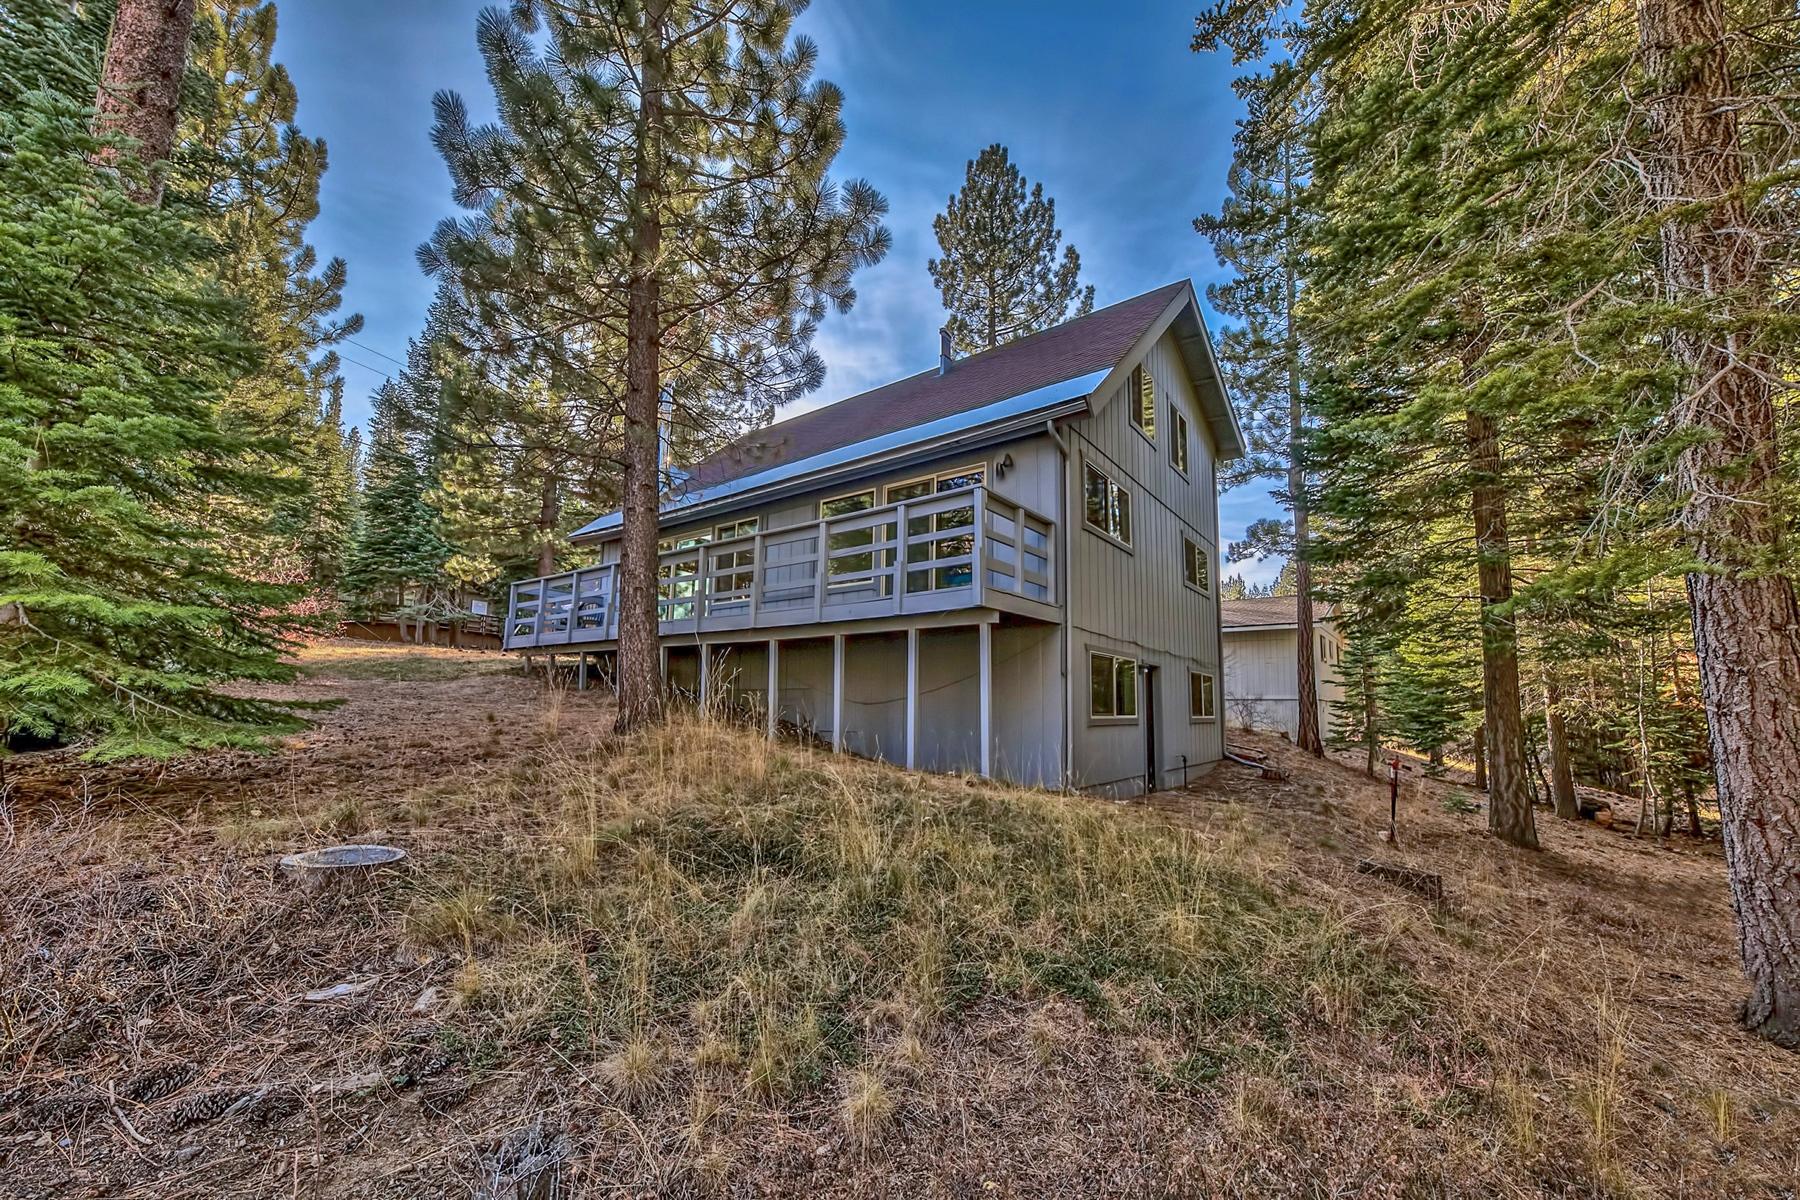 Additional photo for property listing at 1475 Vanderhoof Road, South Lake Tahoe, Ca 96150 1475 Vanderhoof Road South Lake Tahoe, California 96150 United States